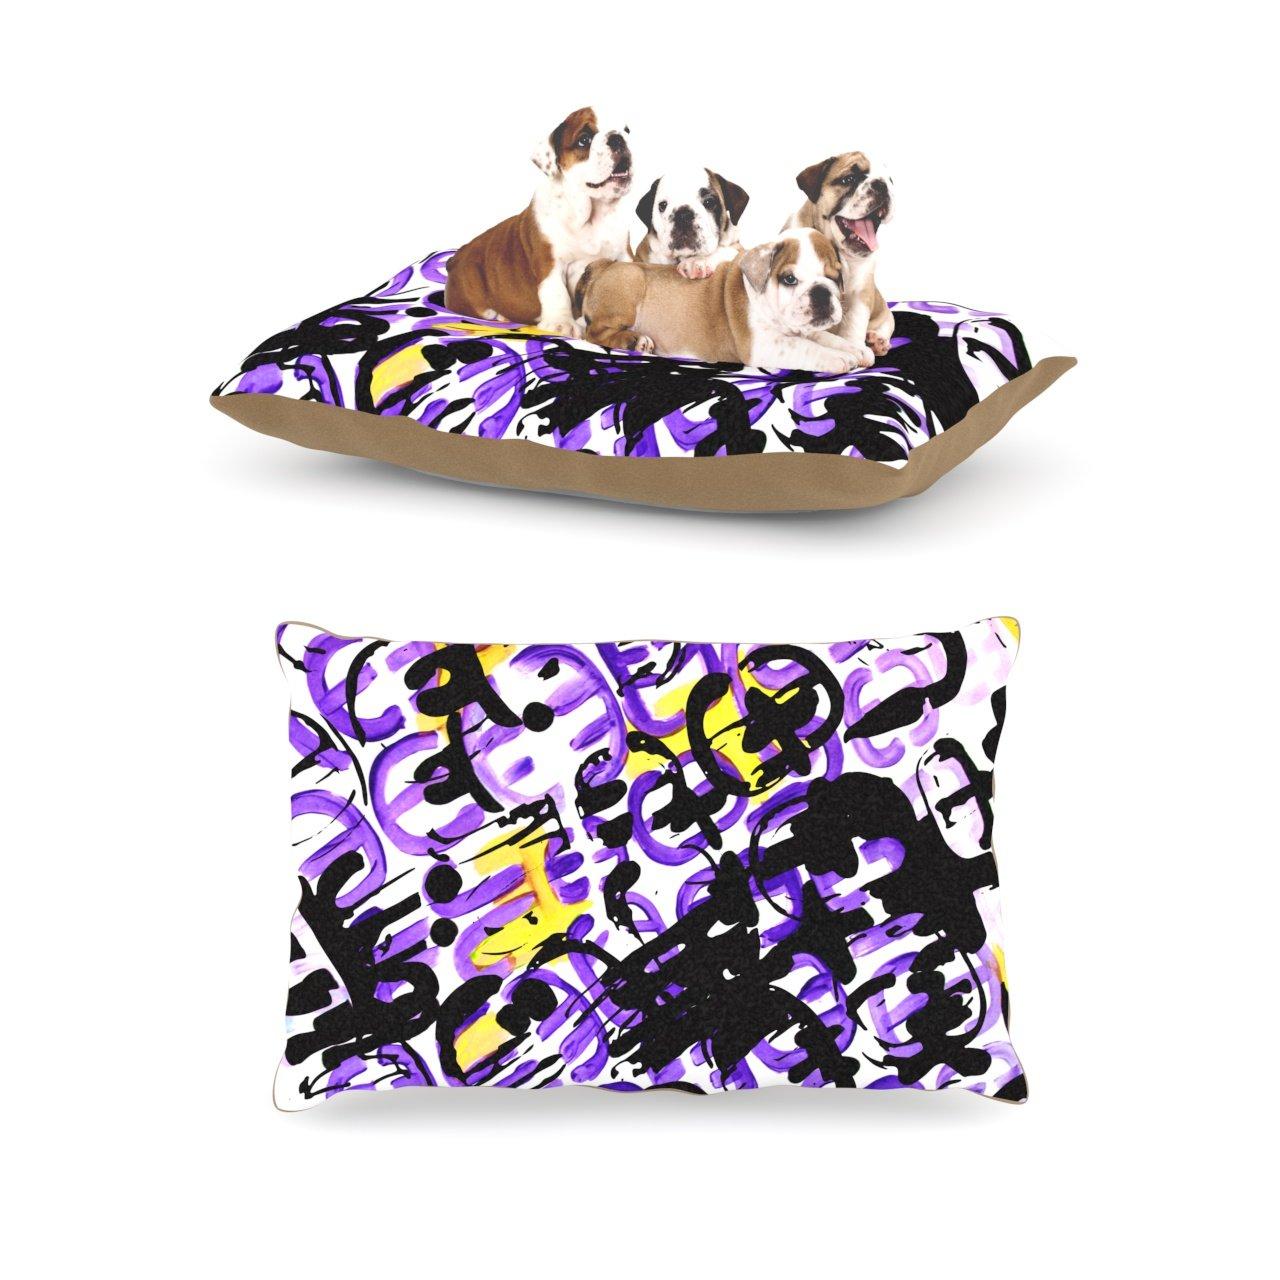 Kess InHouse Theresa Giolzetti Theodora's Mess  Yellow Purple Dog Bed